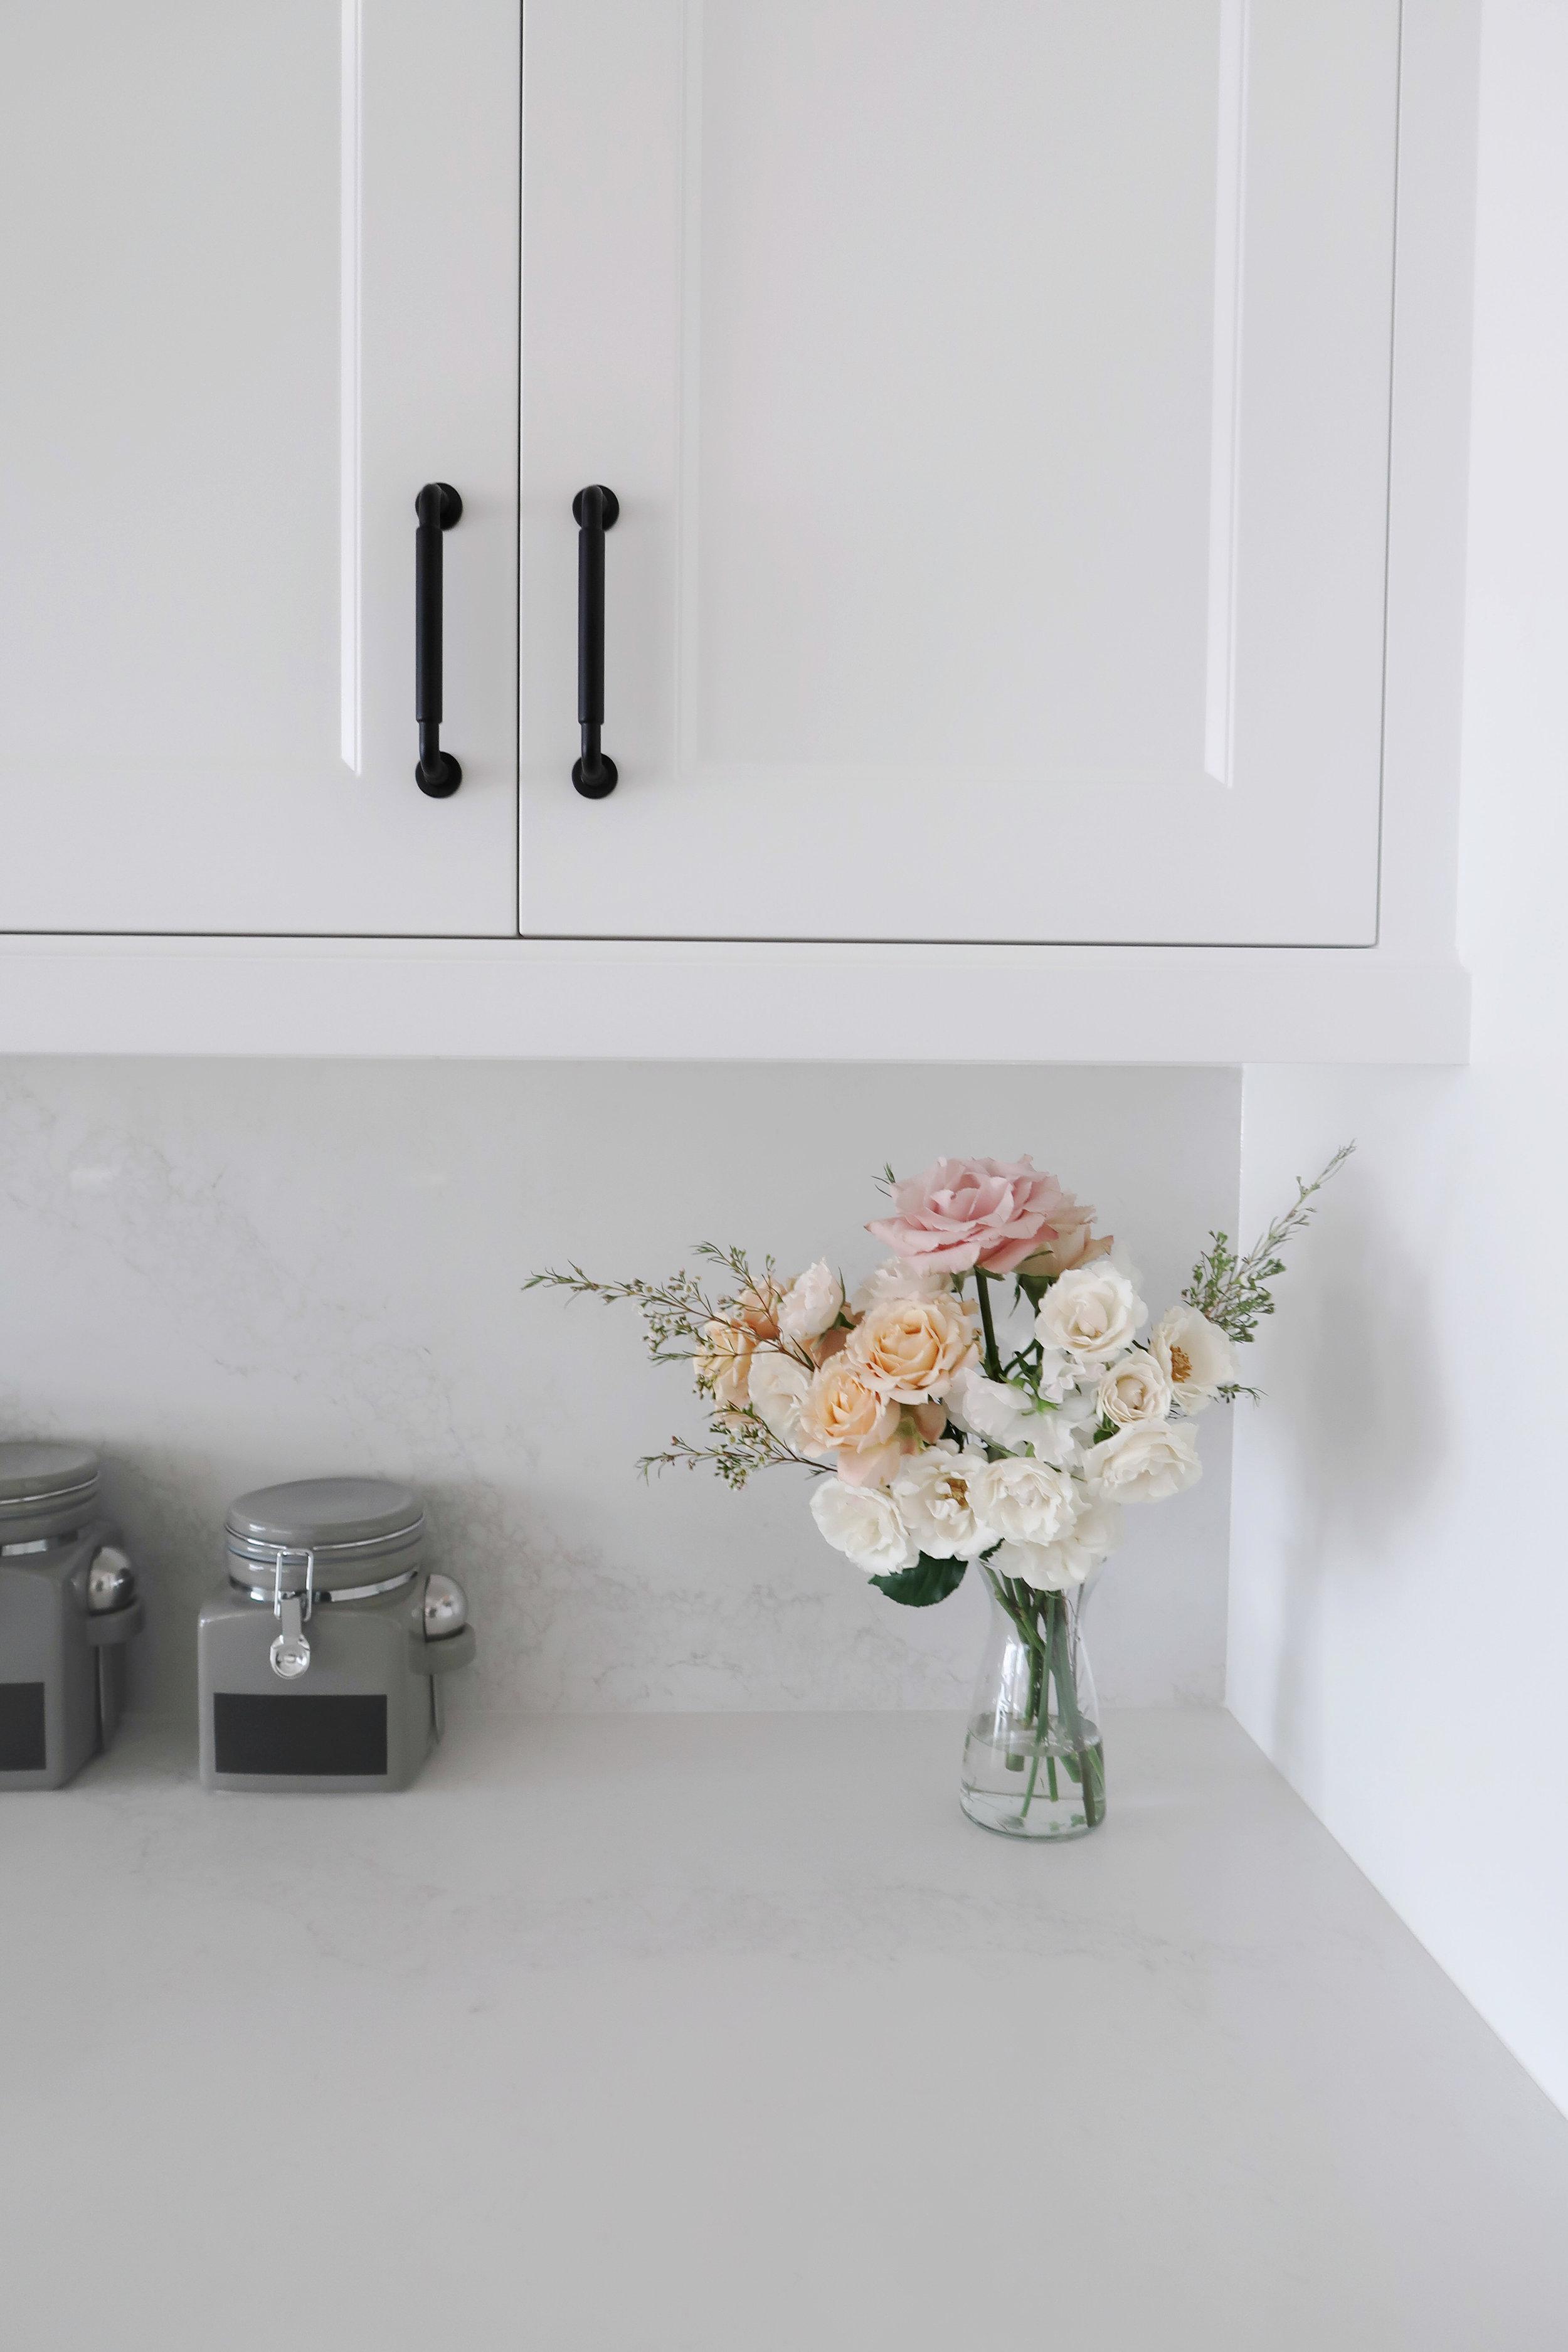 laurennicolefoot-2019-april-wedding-floral-home-3 copy.jpg